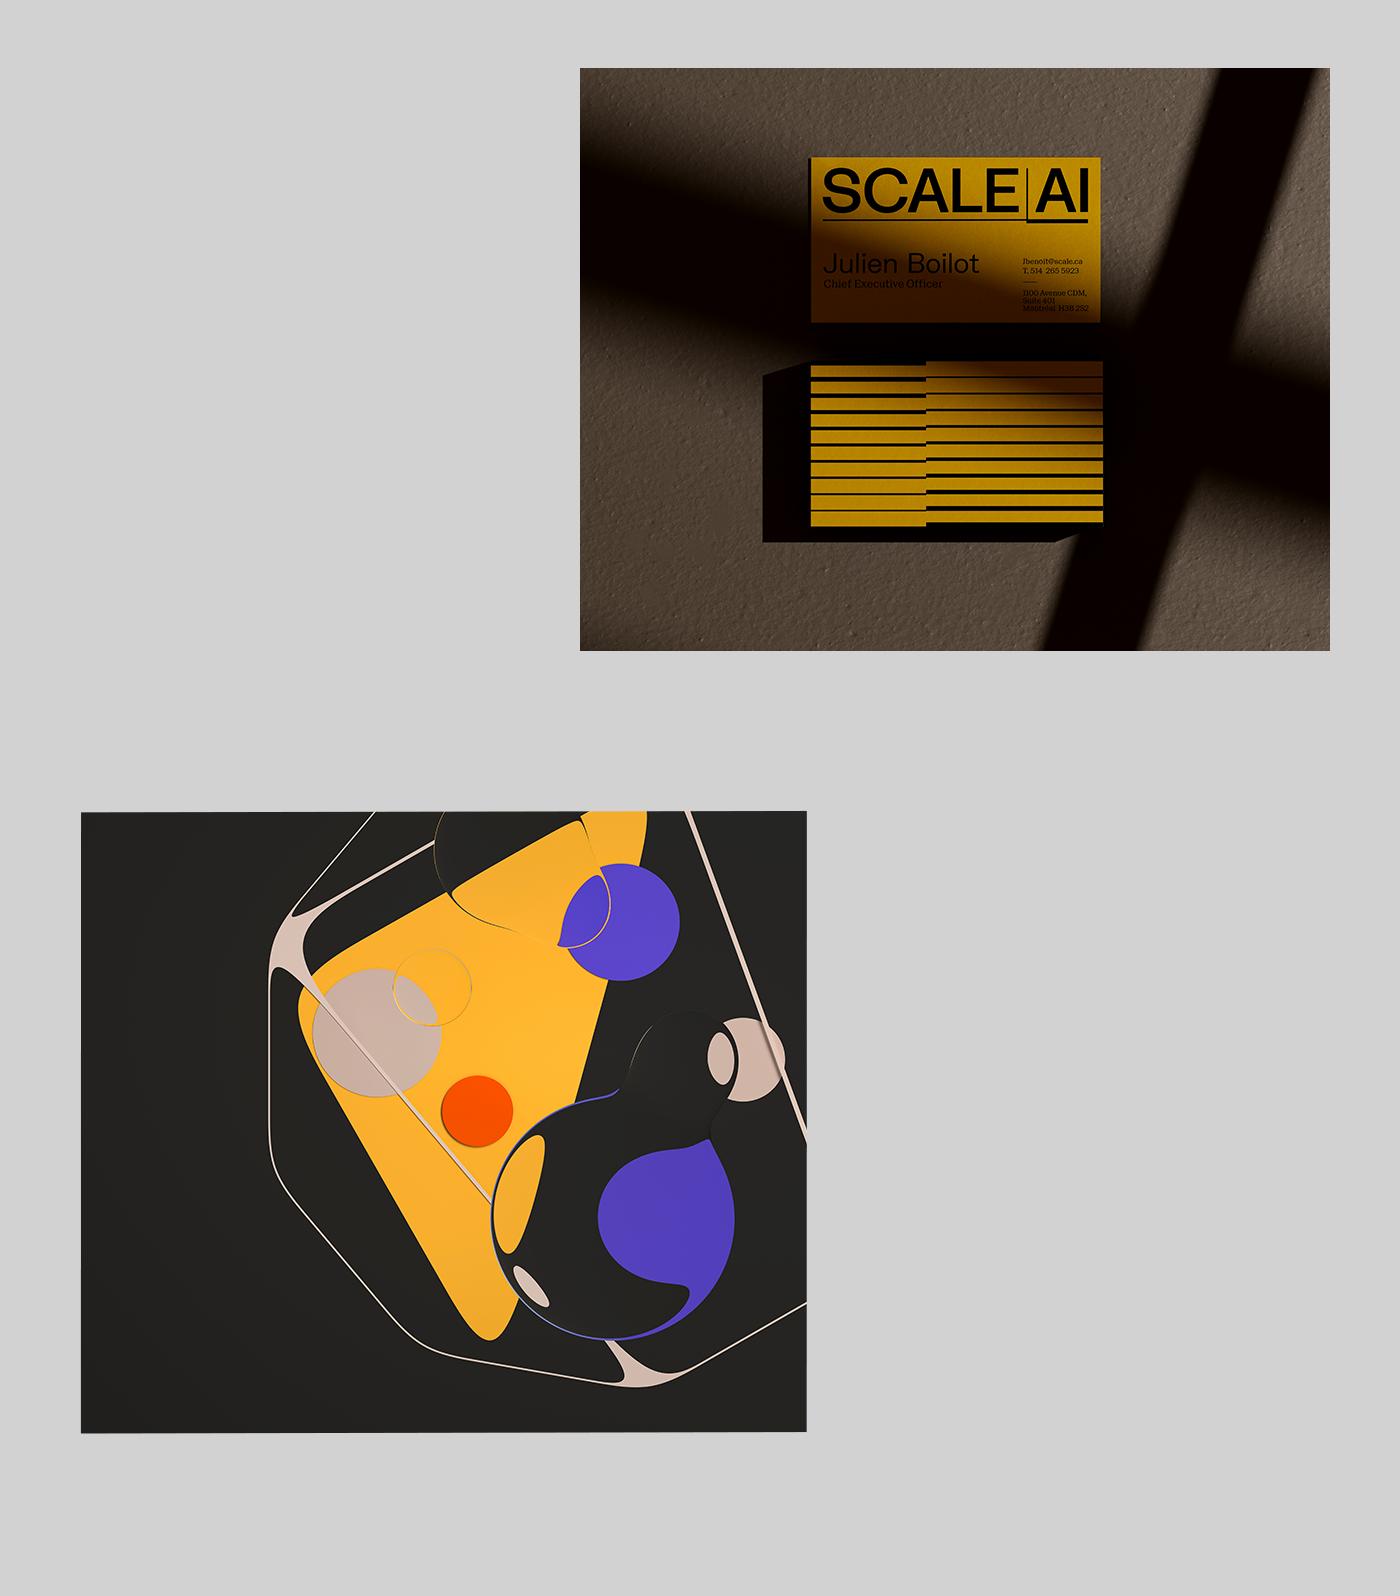 3D,ai,branding ,design,future,ILLUSTRATION ,Layout,logo,Montreal,motion